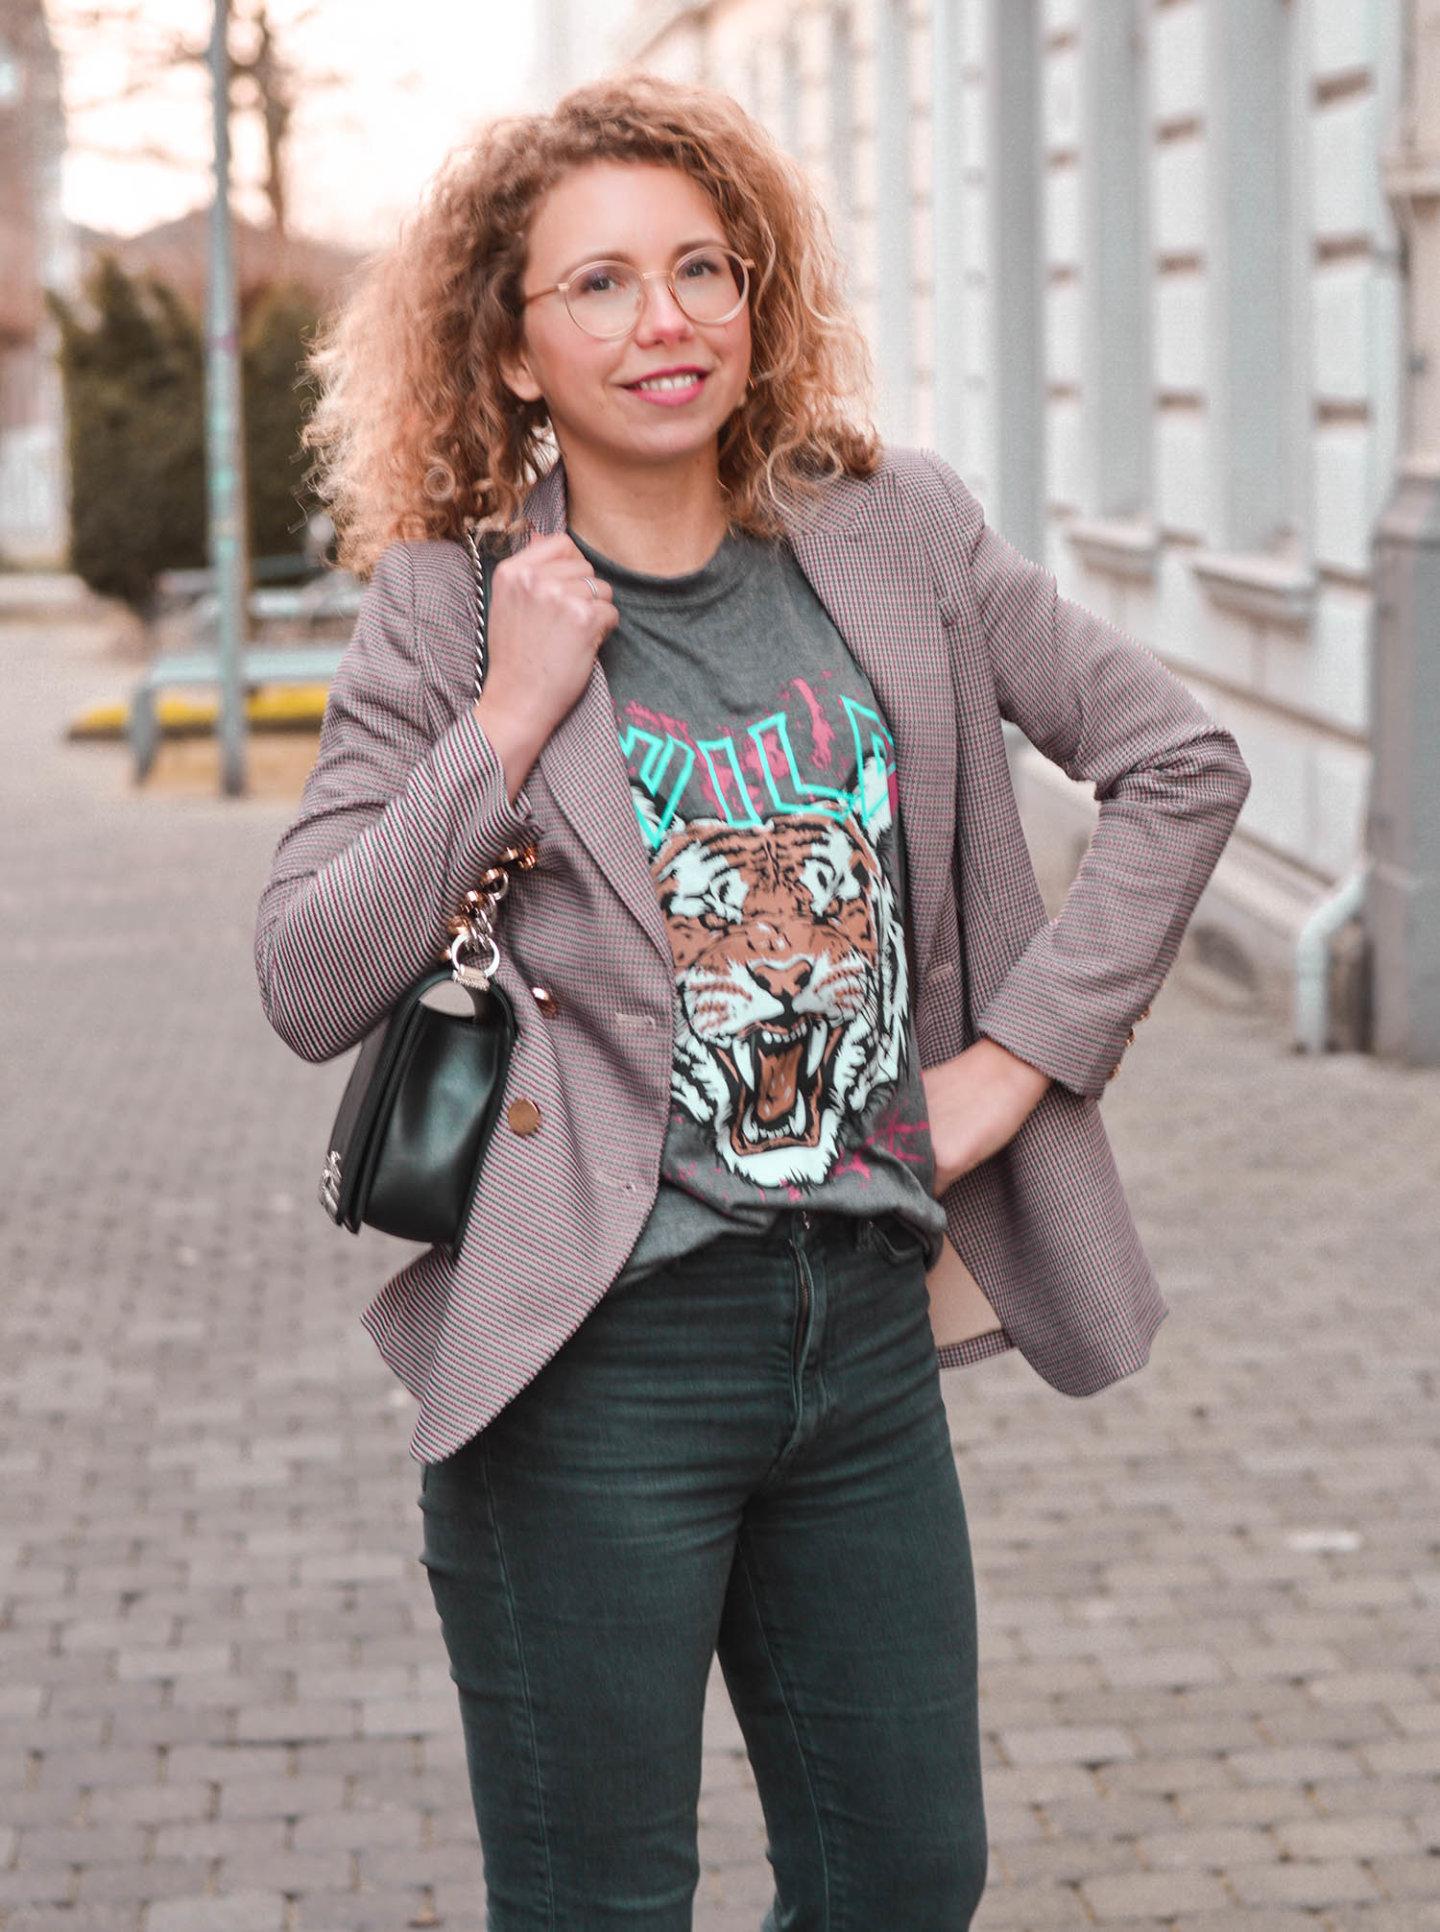 Band-Shirt - Anina Bing, Oh April und Co.